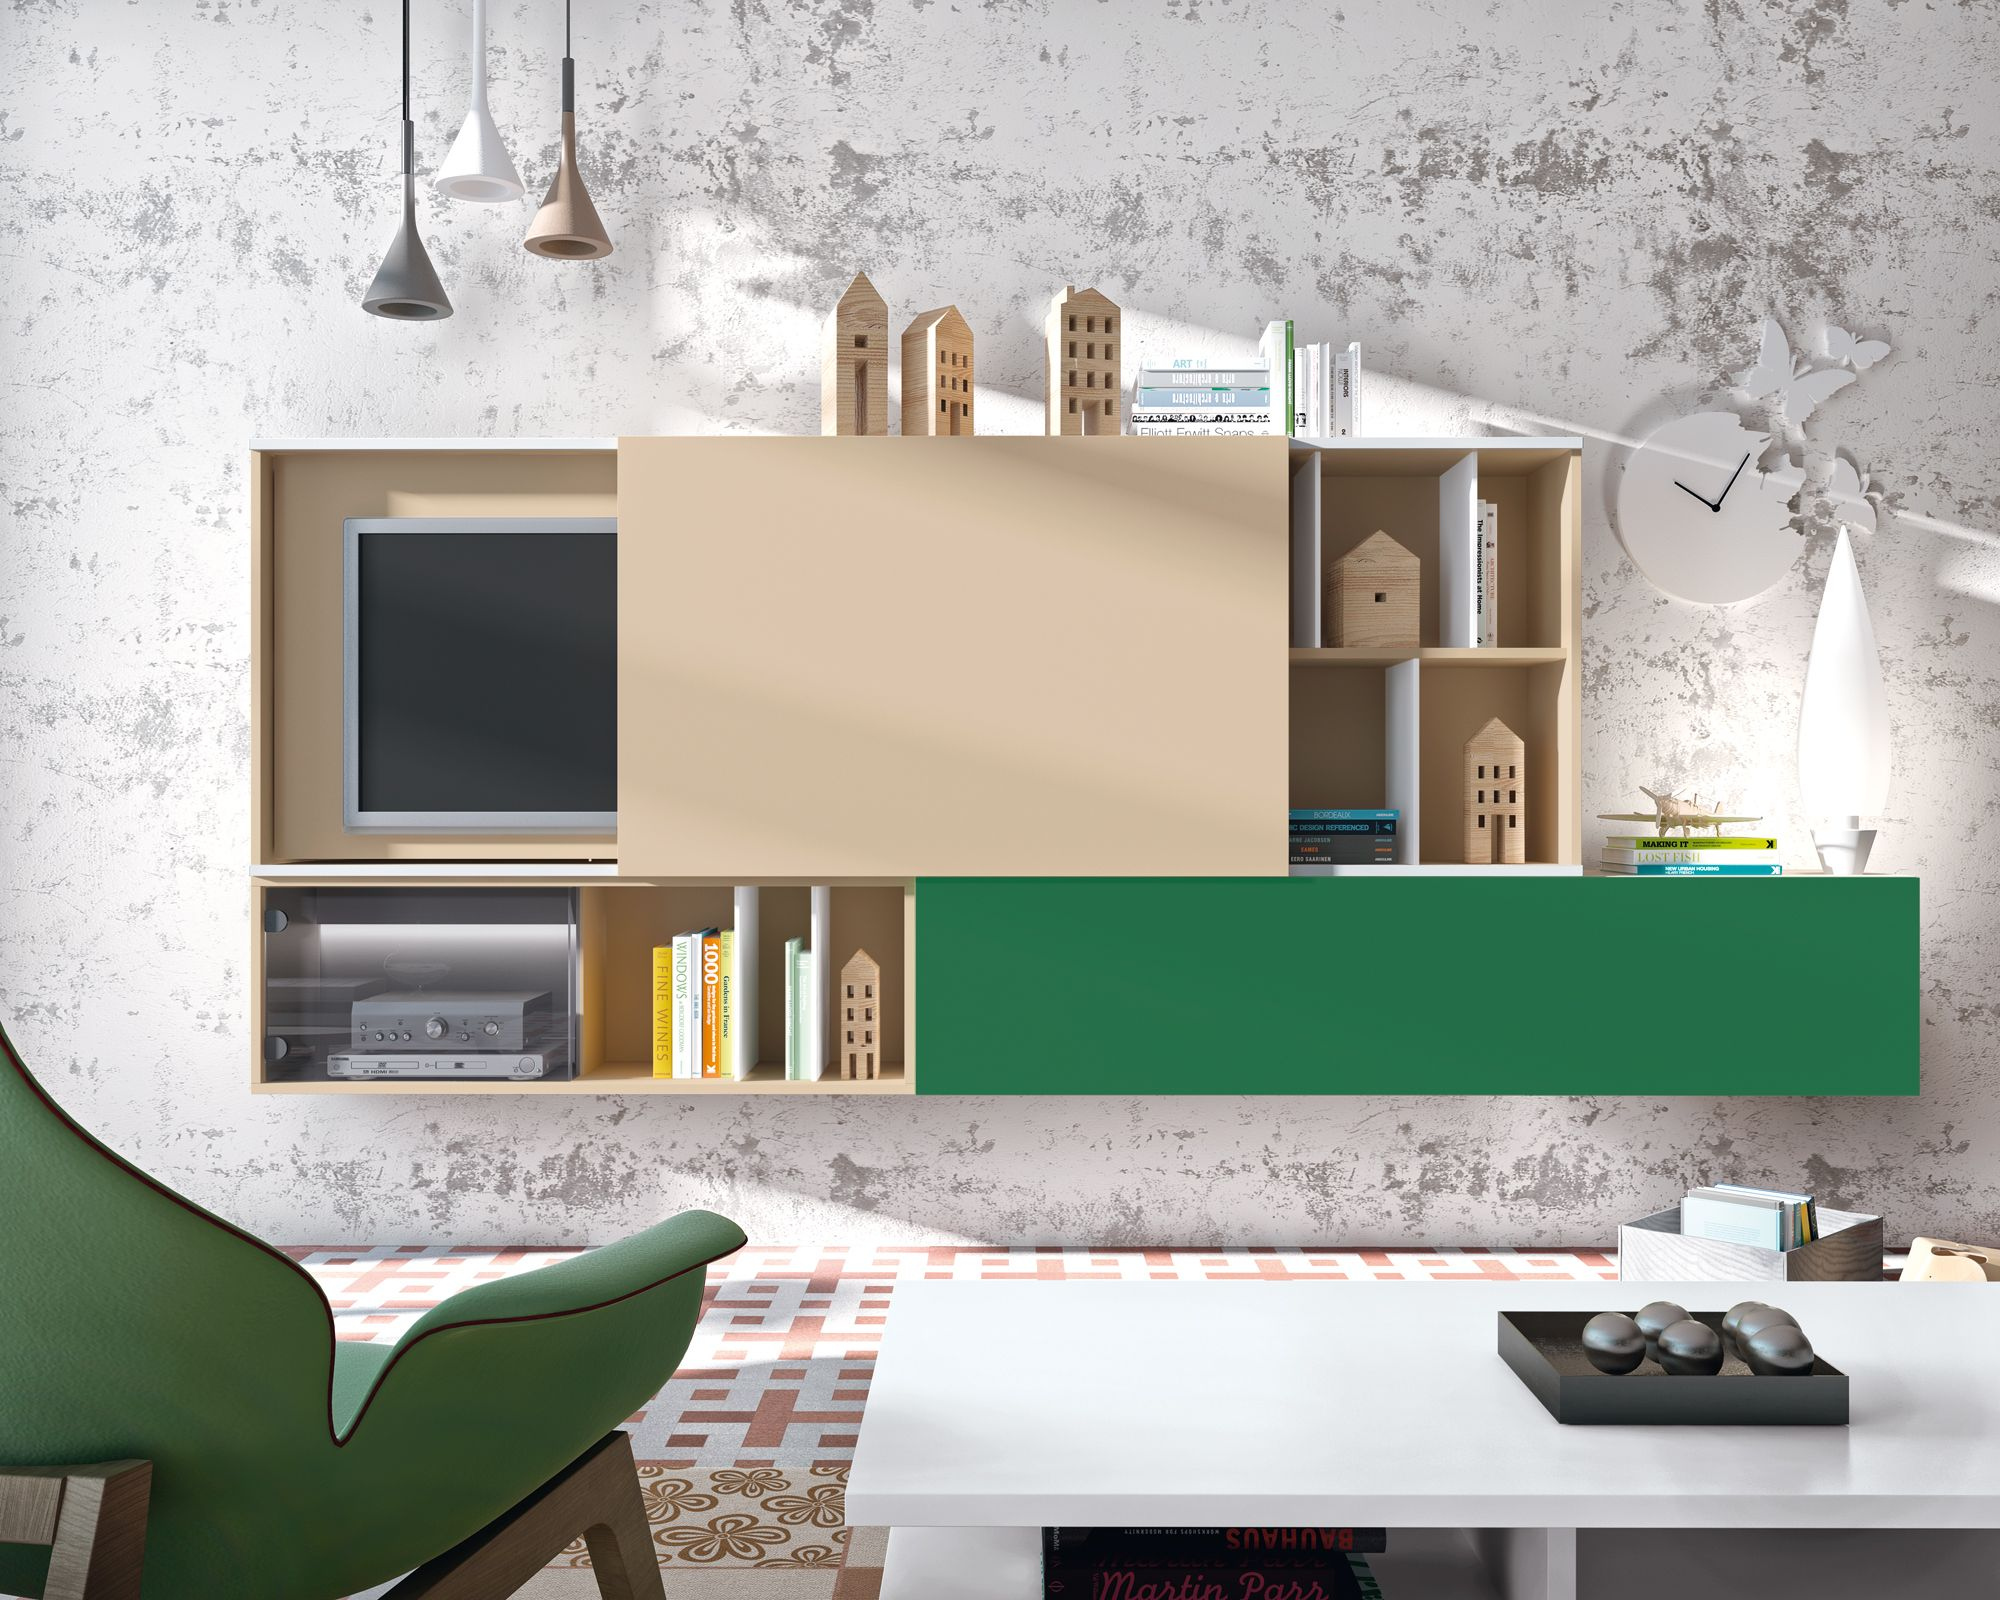 Disfruta del mueble de dise o composici n modular basada for Mueble ocultar tv